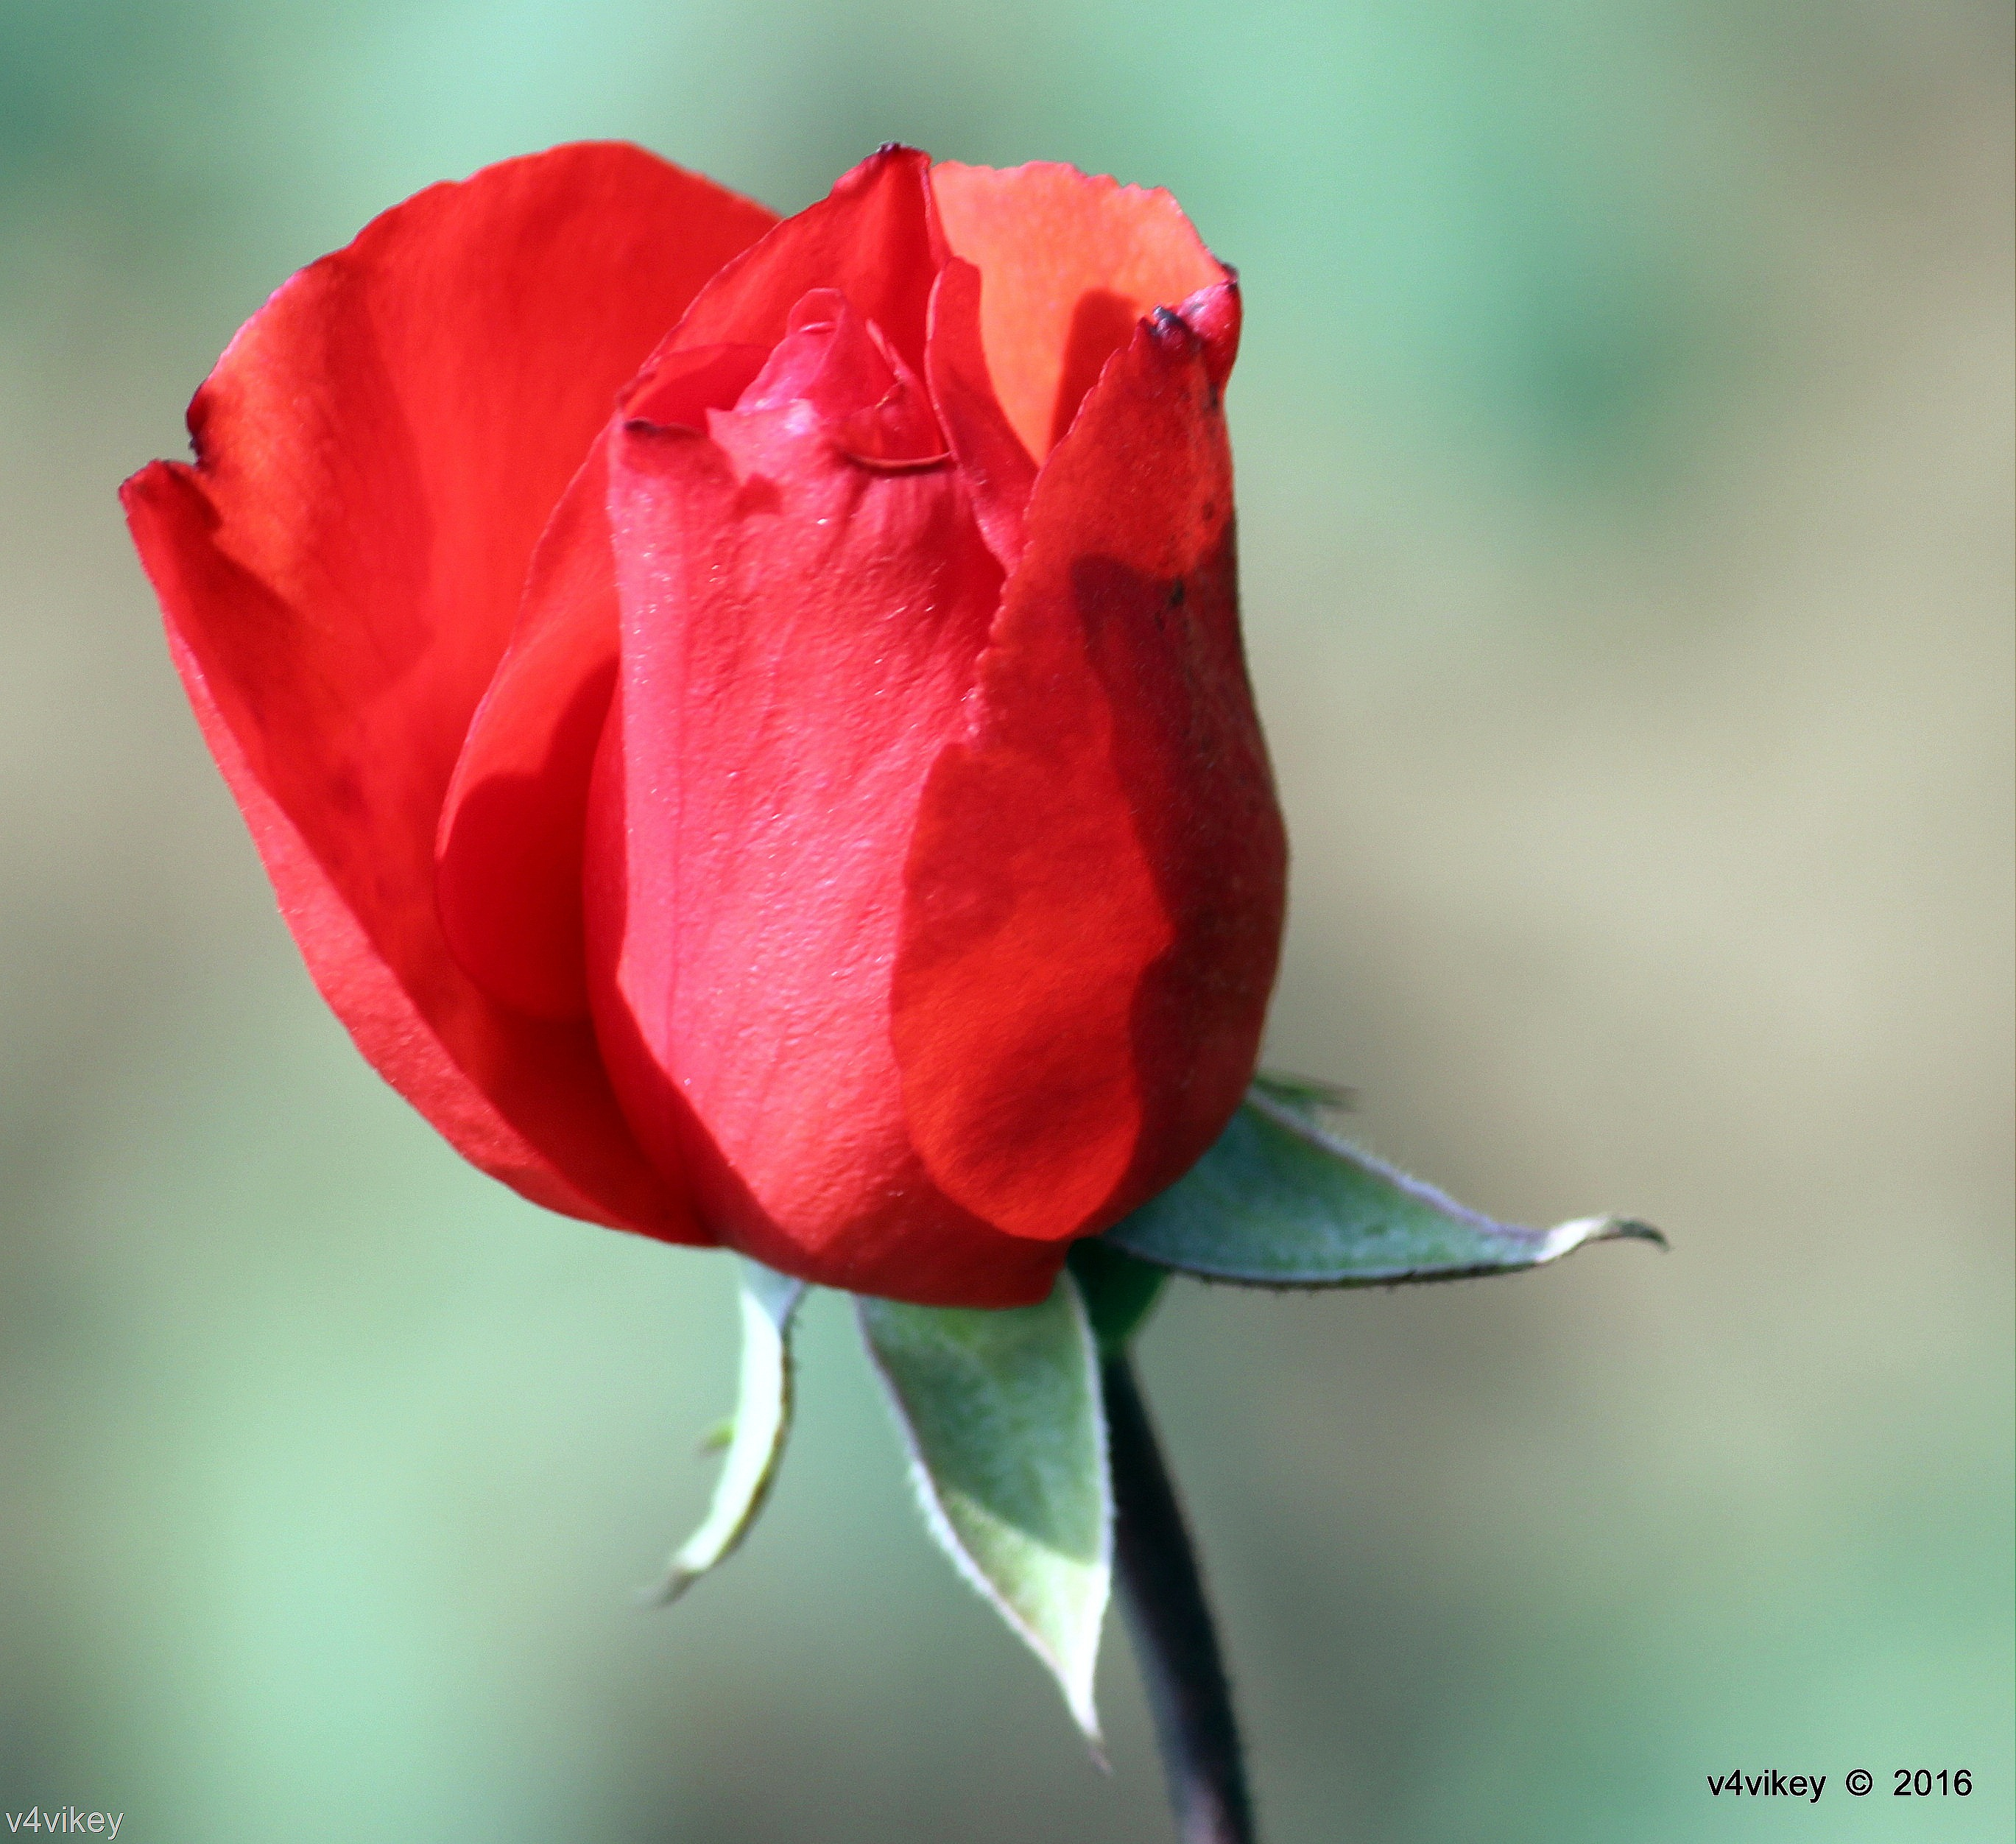 Roses Wallpaper : Red Color Rose bud « Wallpaper Tadka